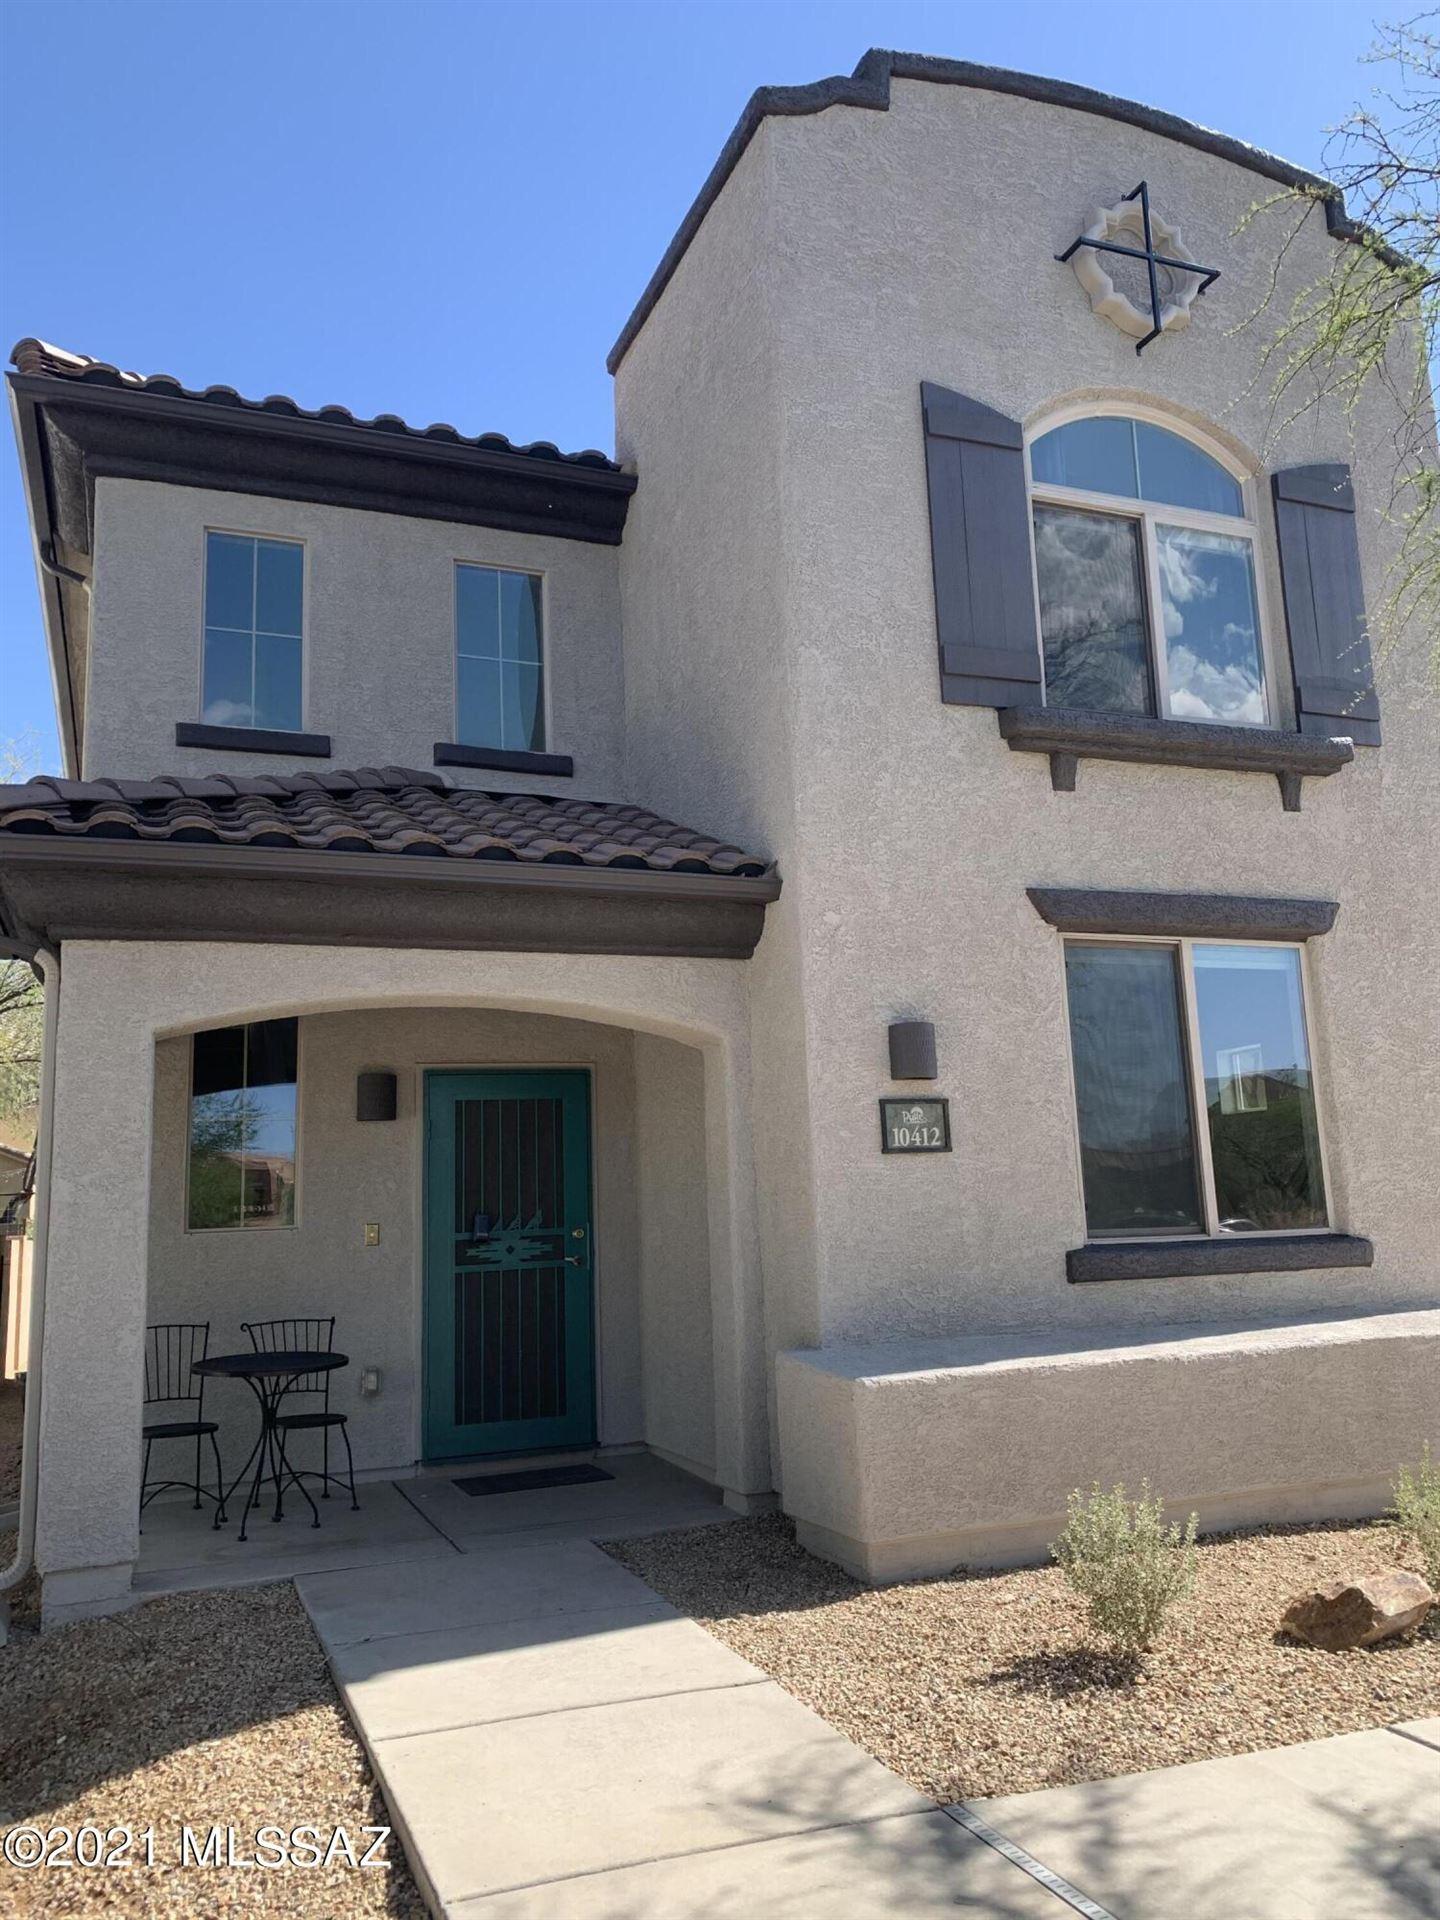 10412 E Capercaillie Street, Tucson, AZ 85747 - MLS#: 22110660